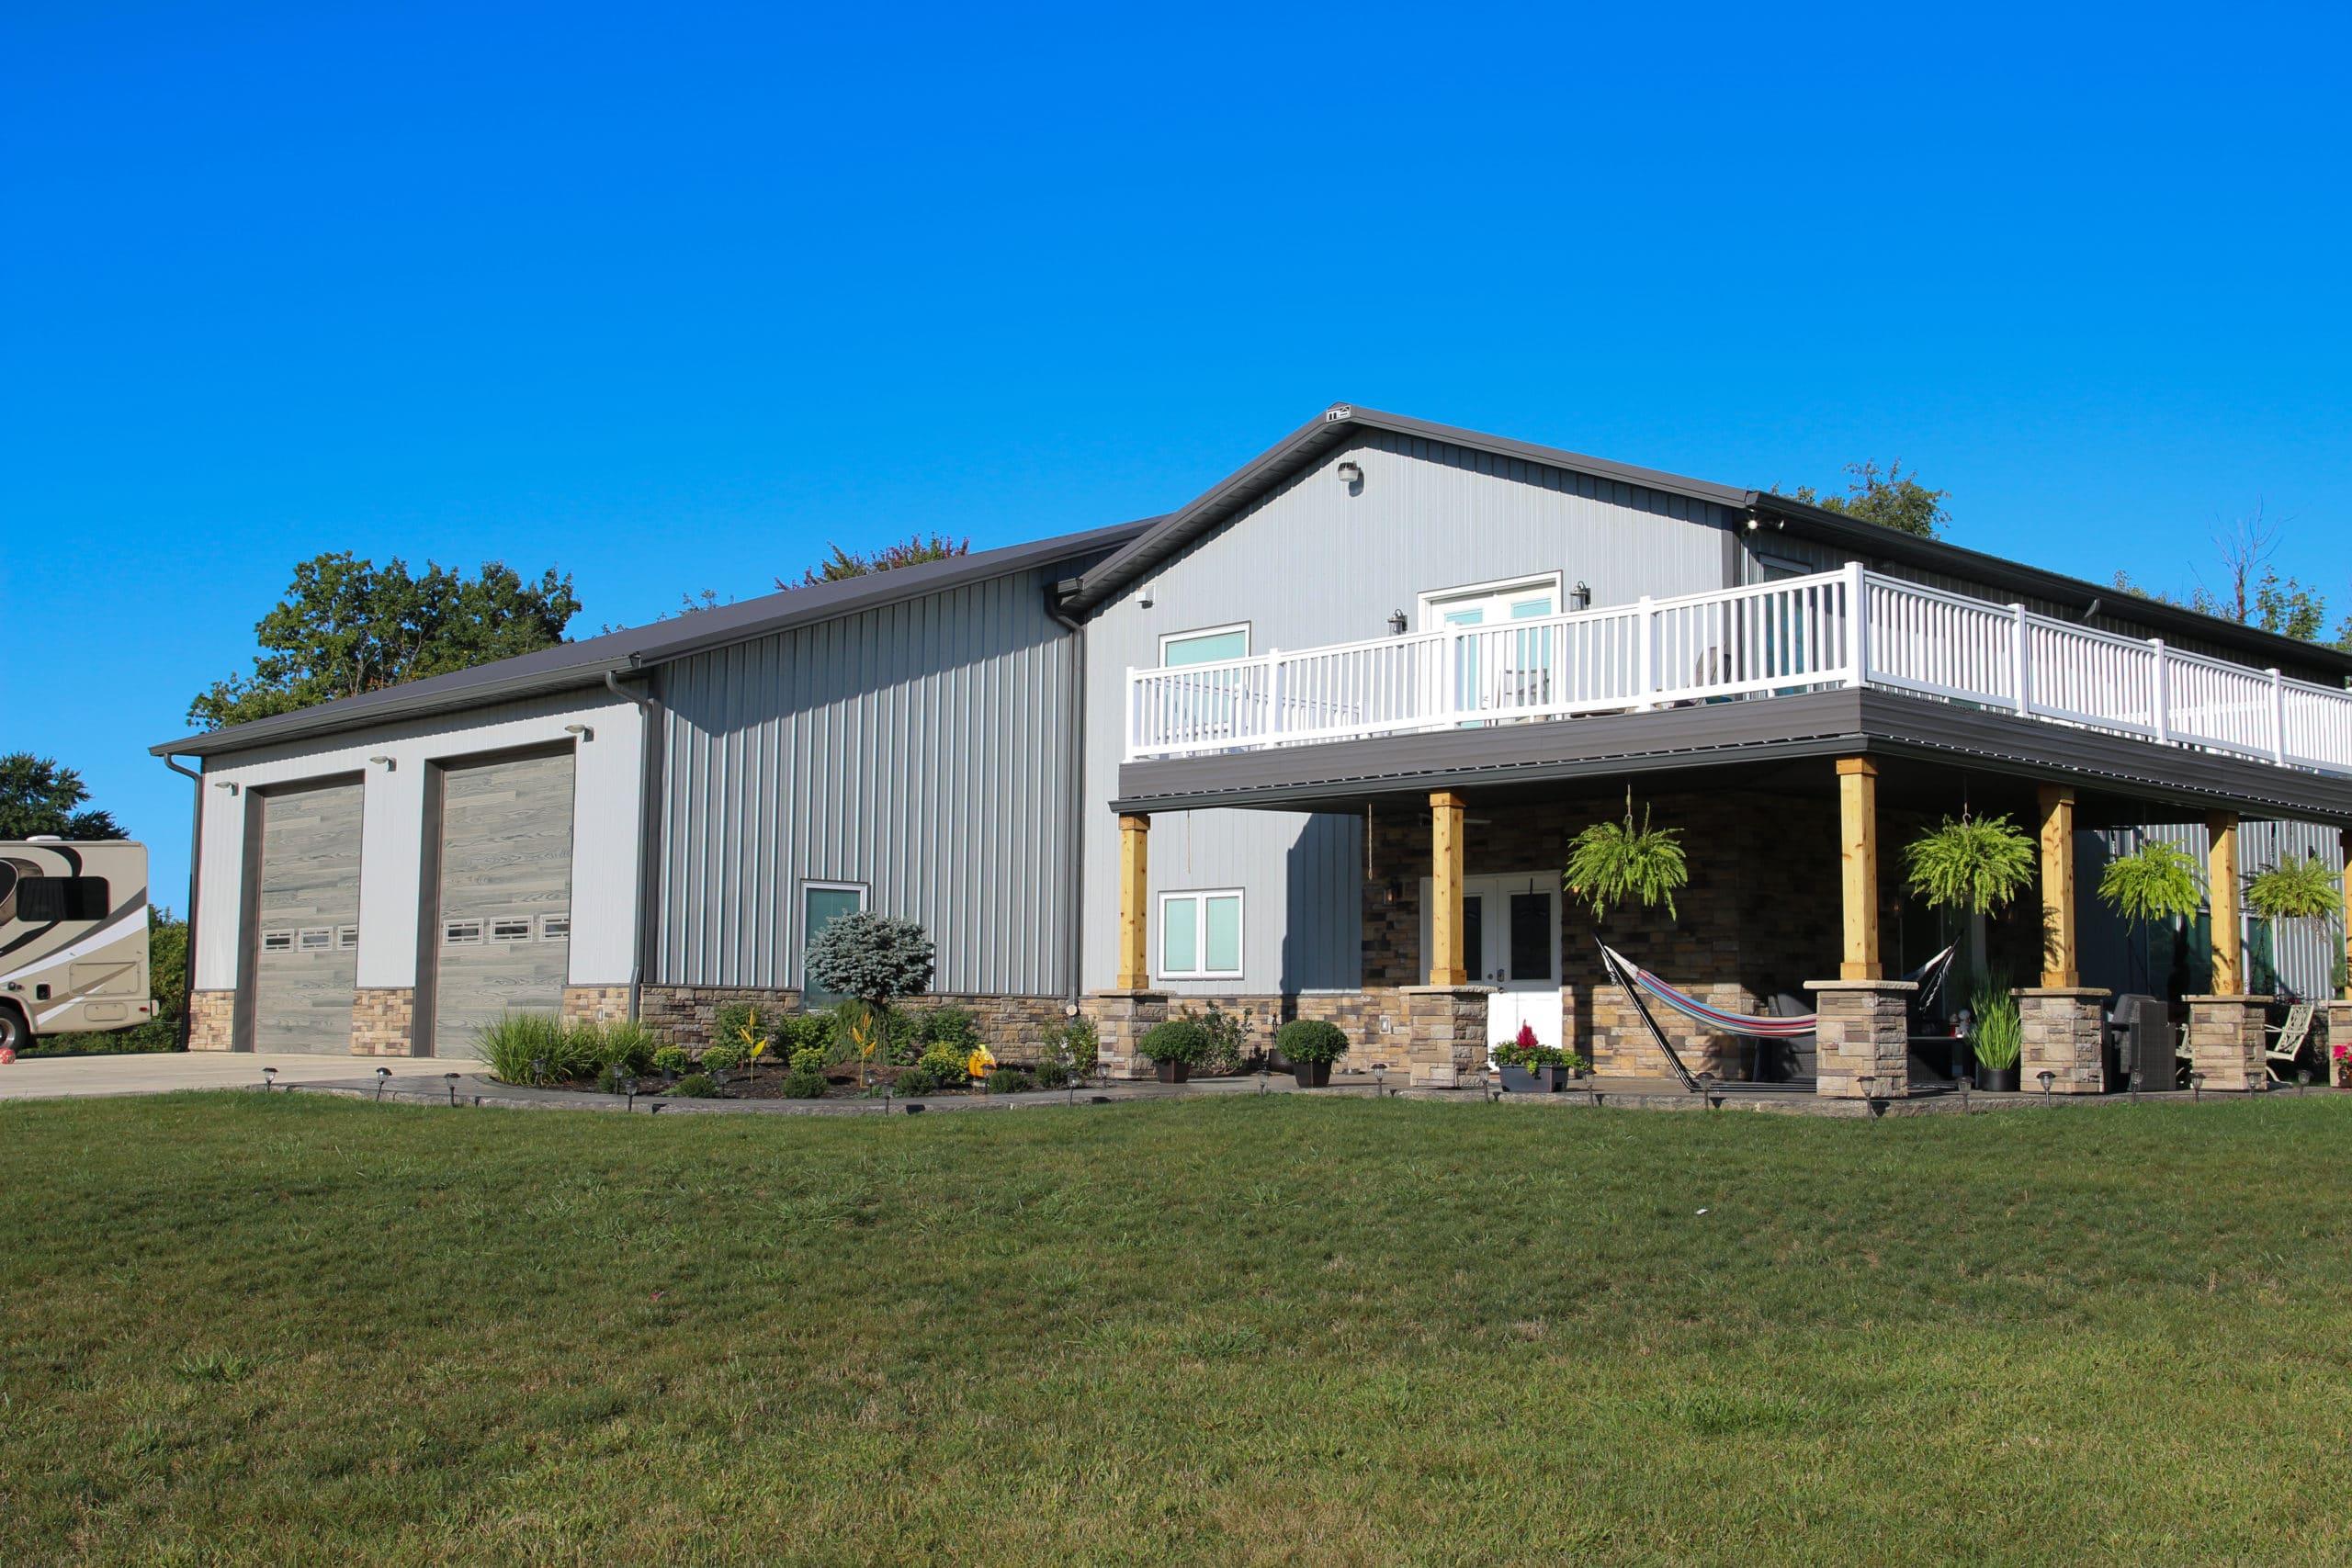 Pole Barn Home in Kokomo, IN